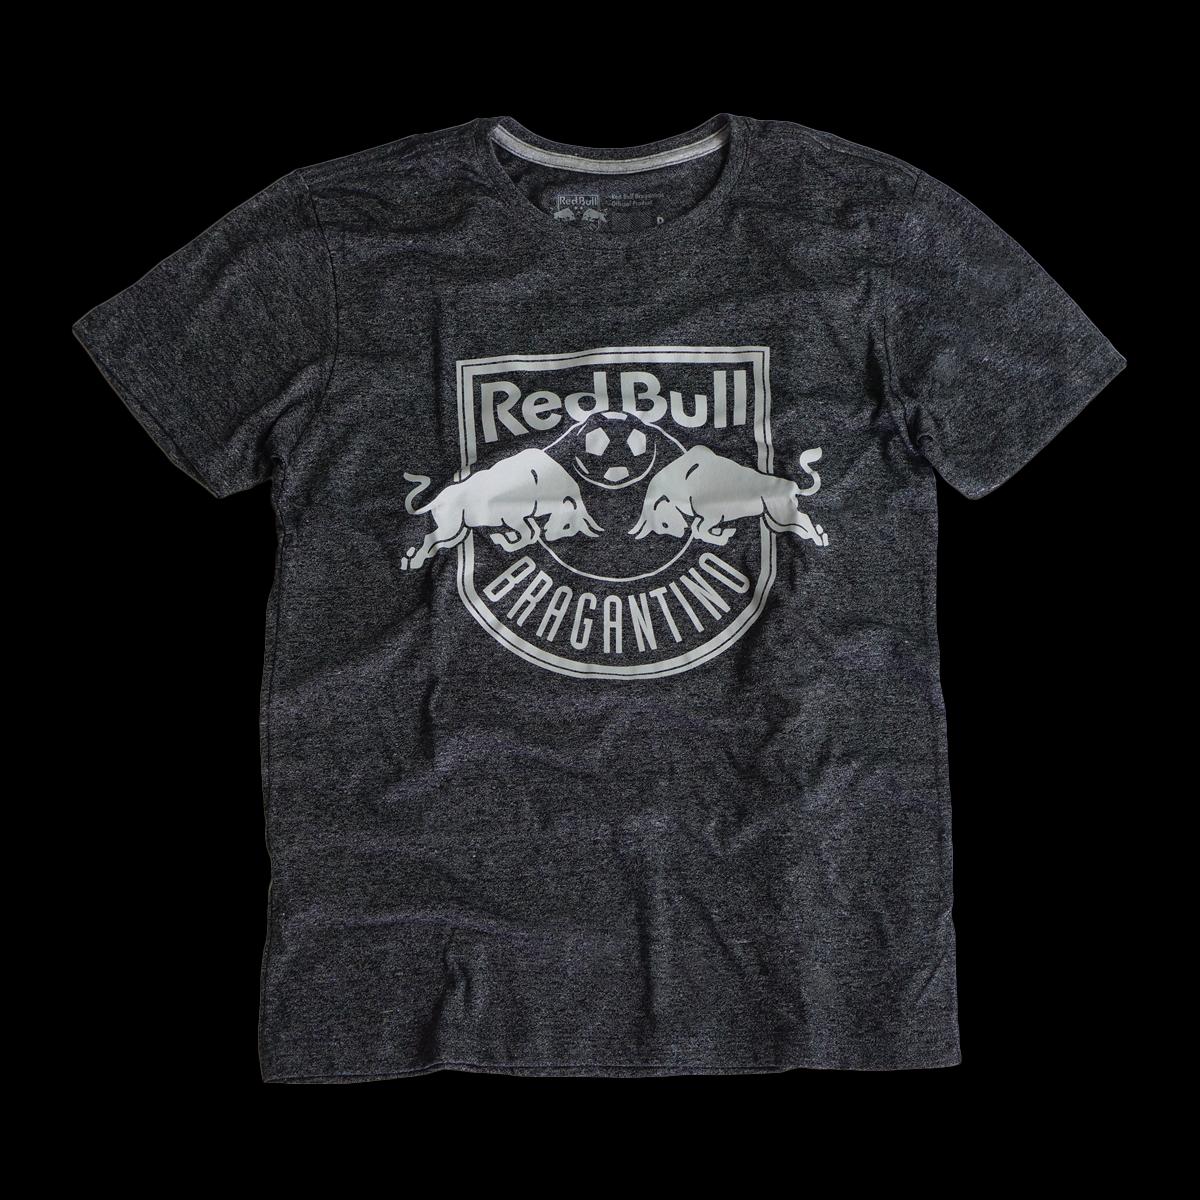 Camiseta Sportwear Feminina Cinza Red Bull Bragantino